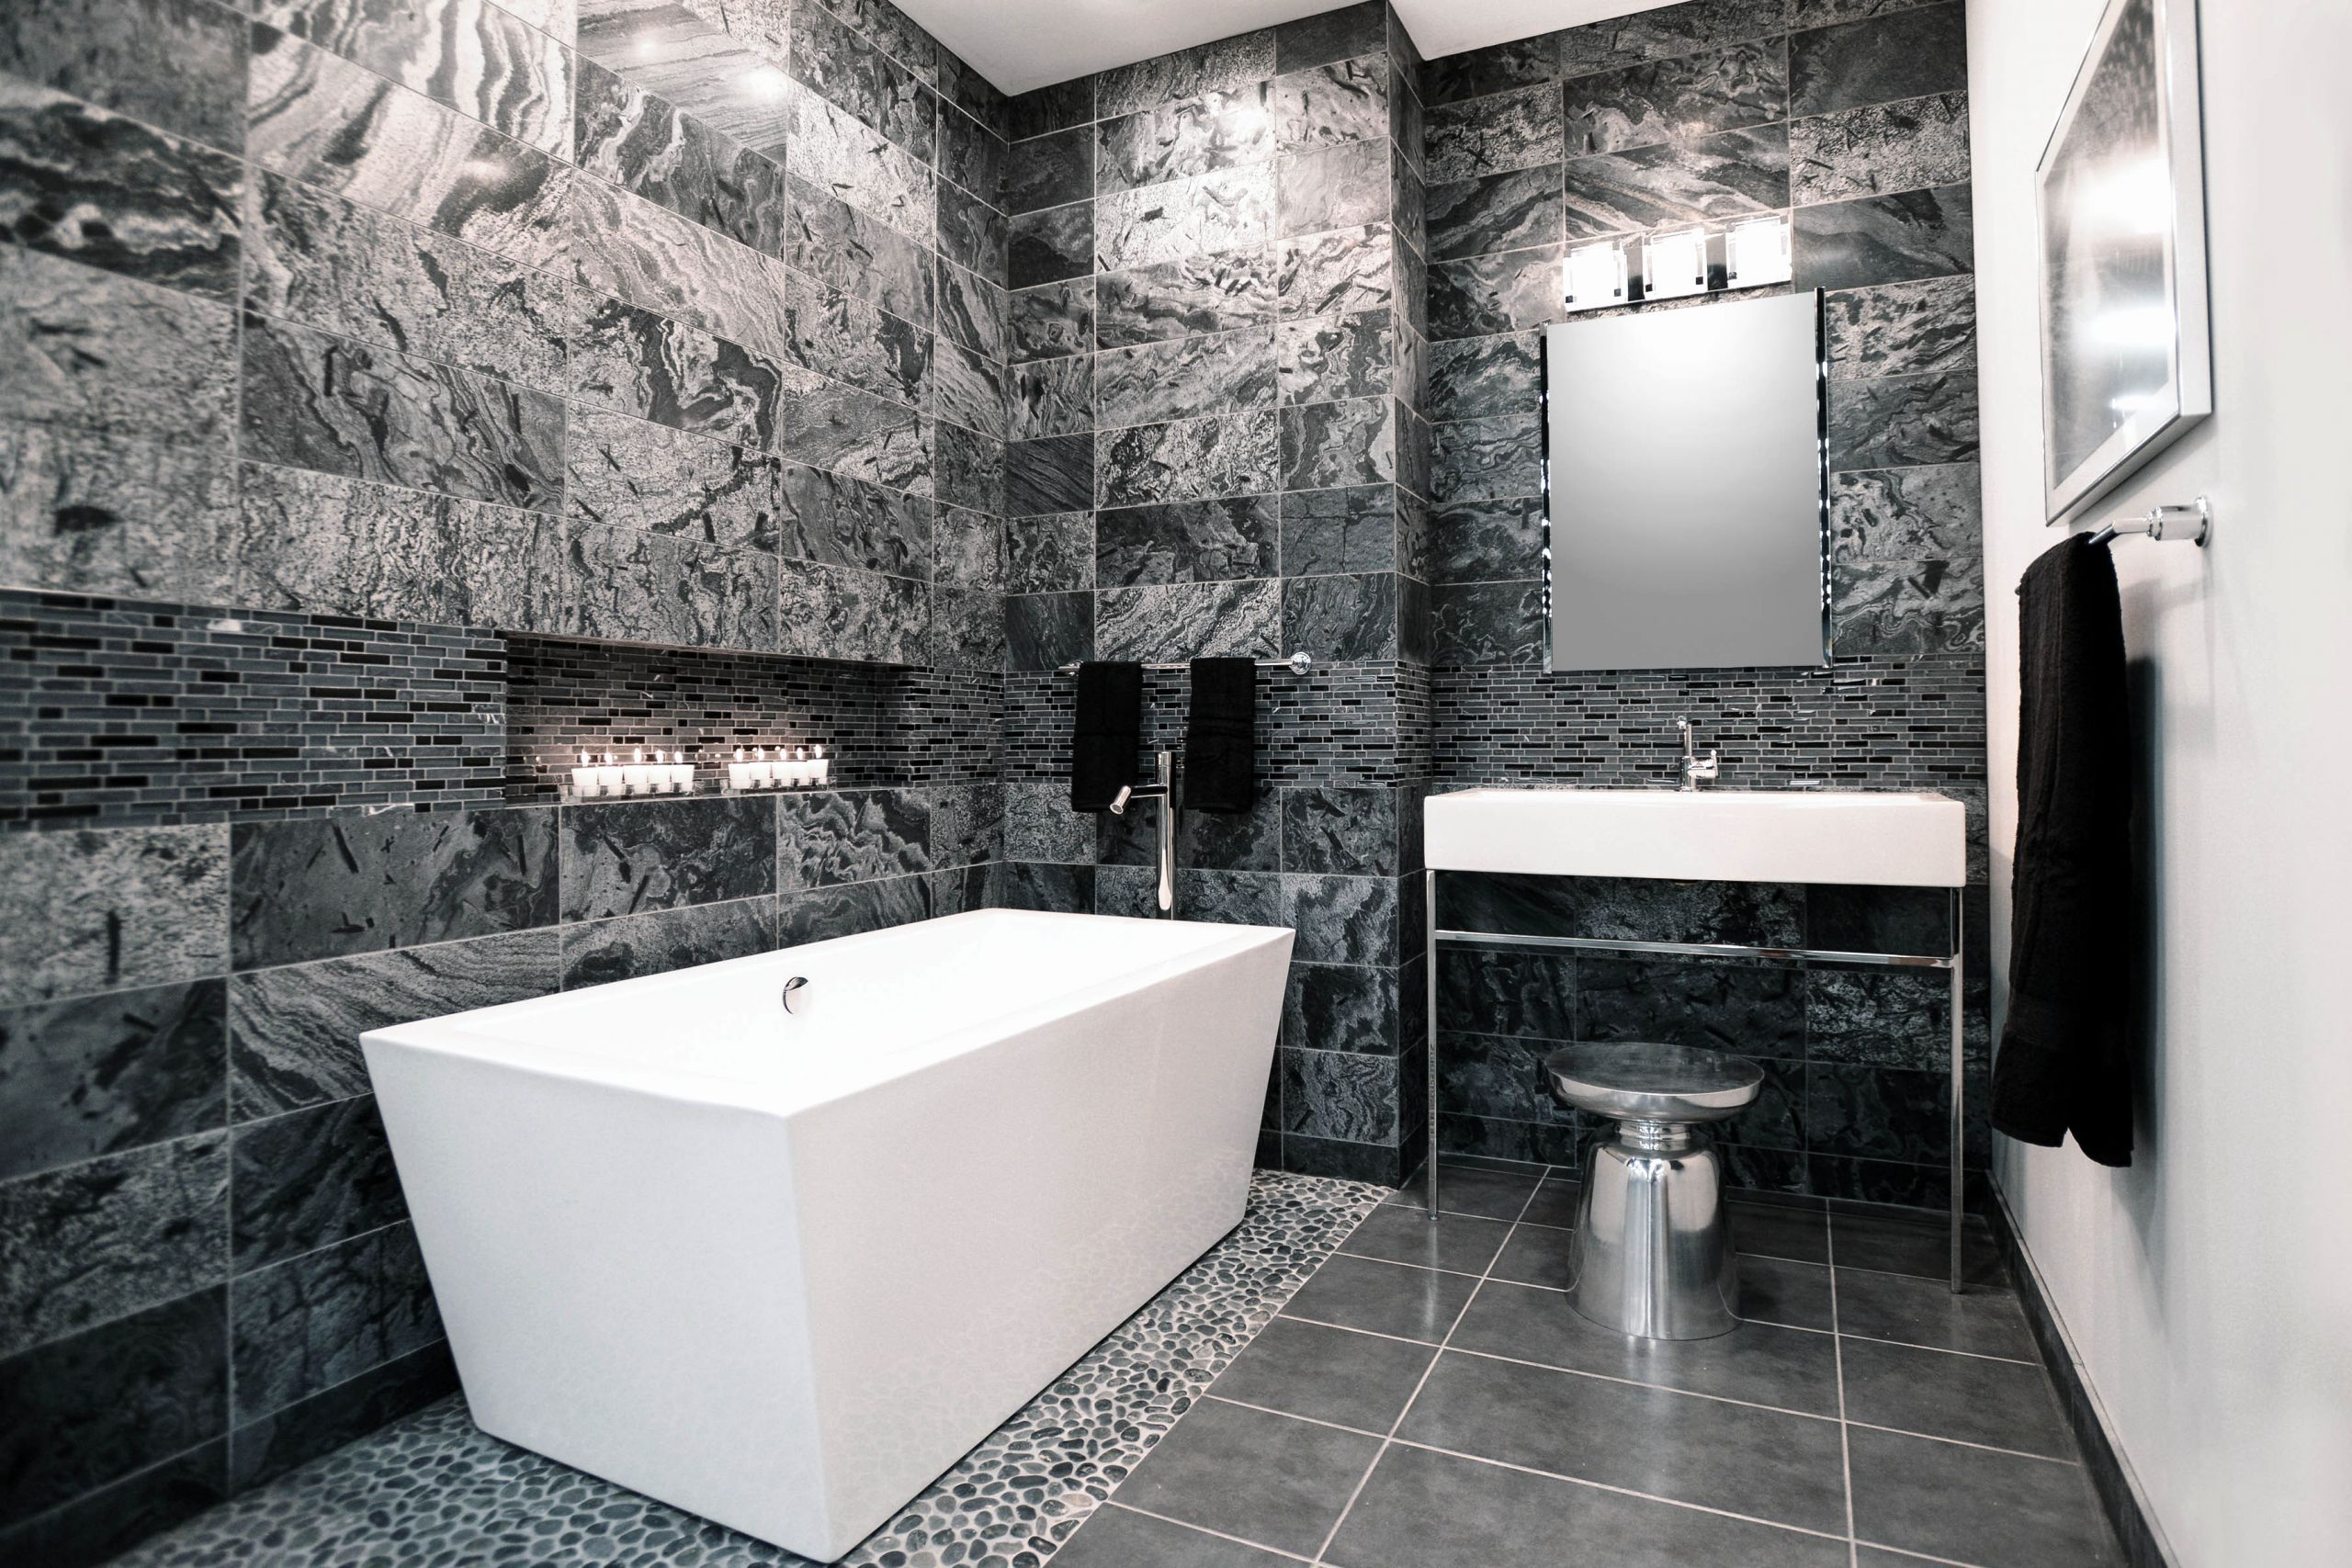 Black And Silver Bathroom Decor Unique The Tile Shop Introduces 2015 Design Preview Providing Inspirati In 2020 Silver Bathroom Black Bathroom Black And Silver Bedroom